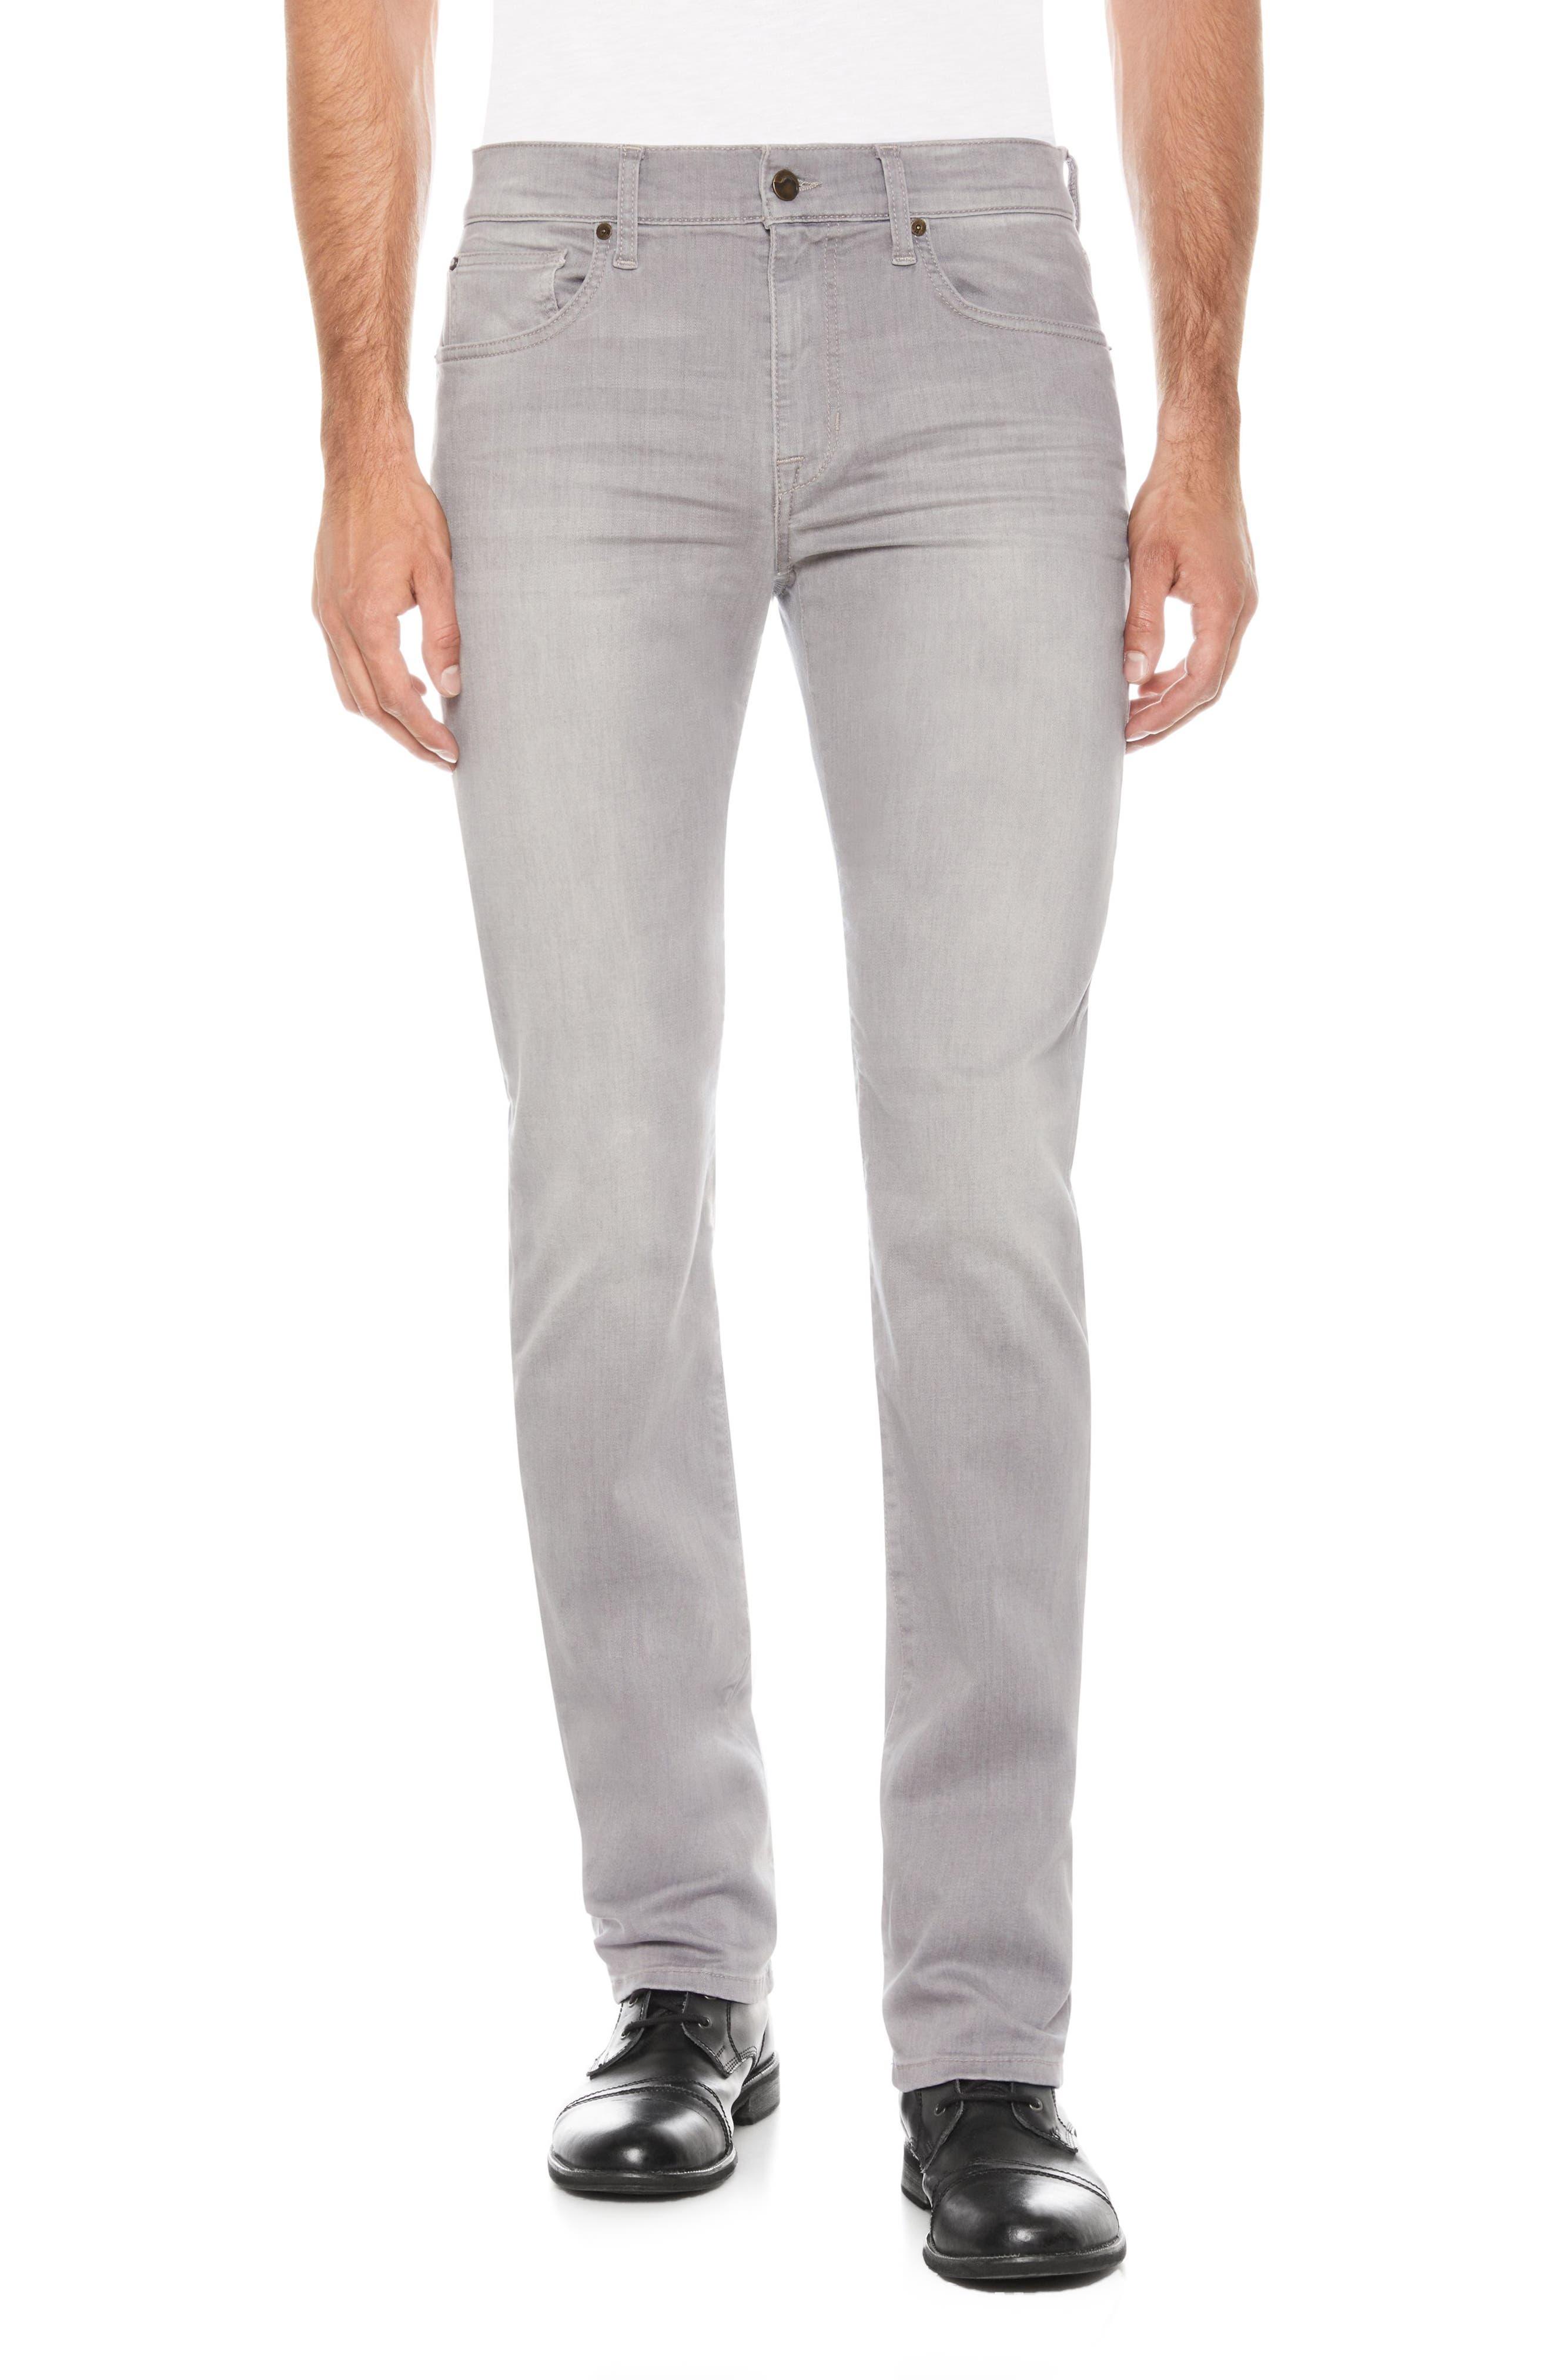 Brixton Slim Straight Fit Jeans,                         Main,                         color, Steve